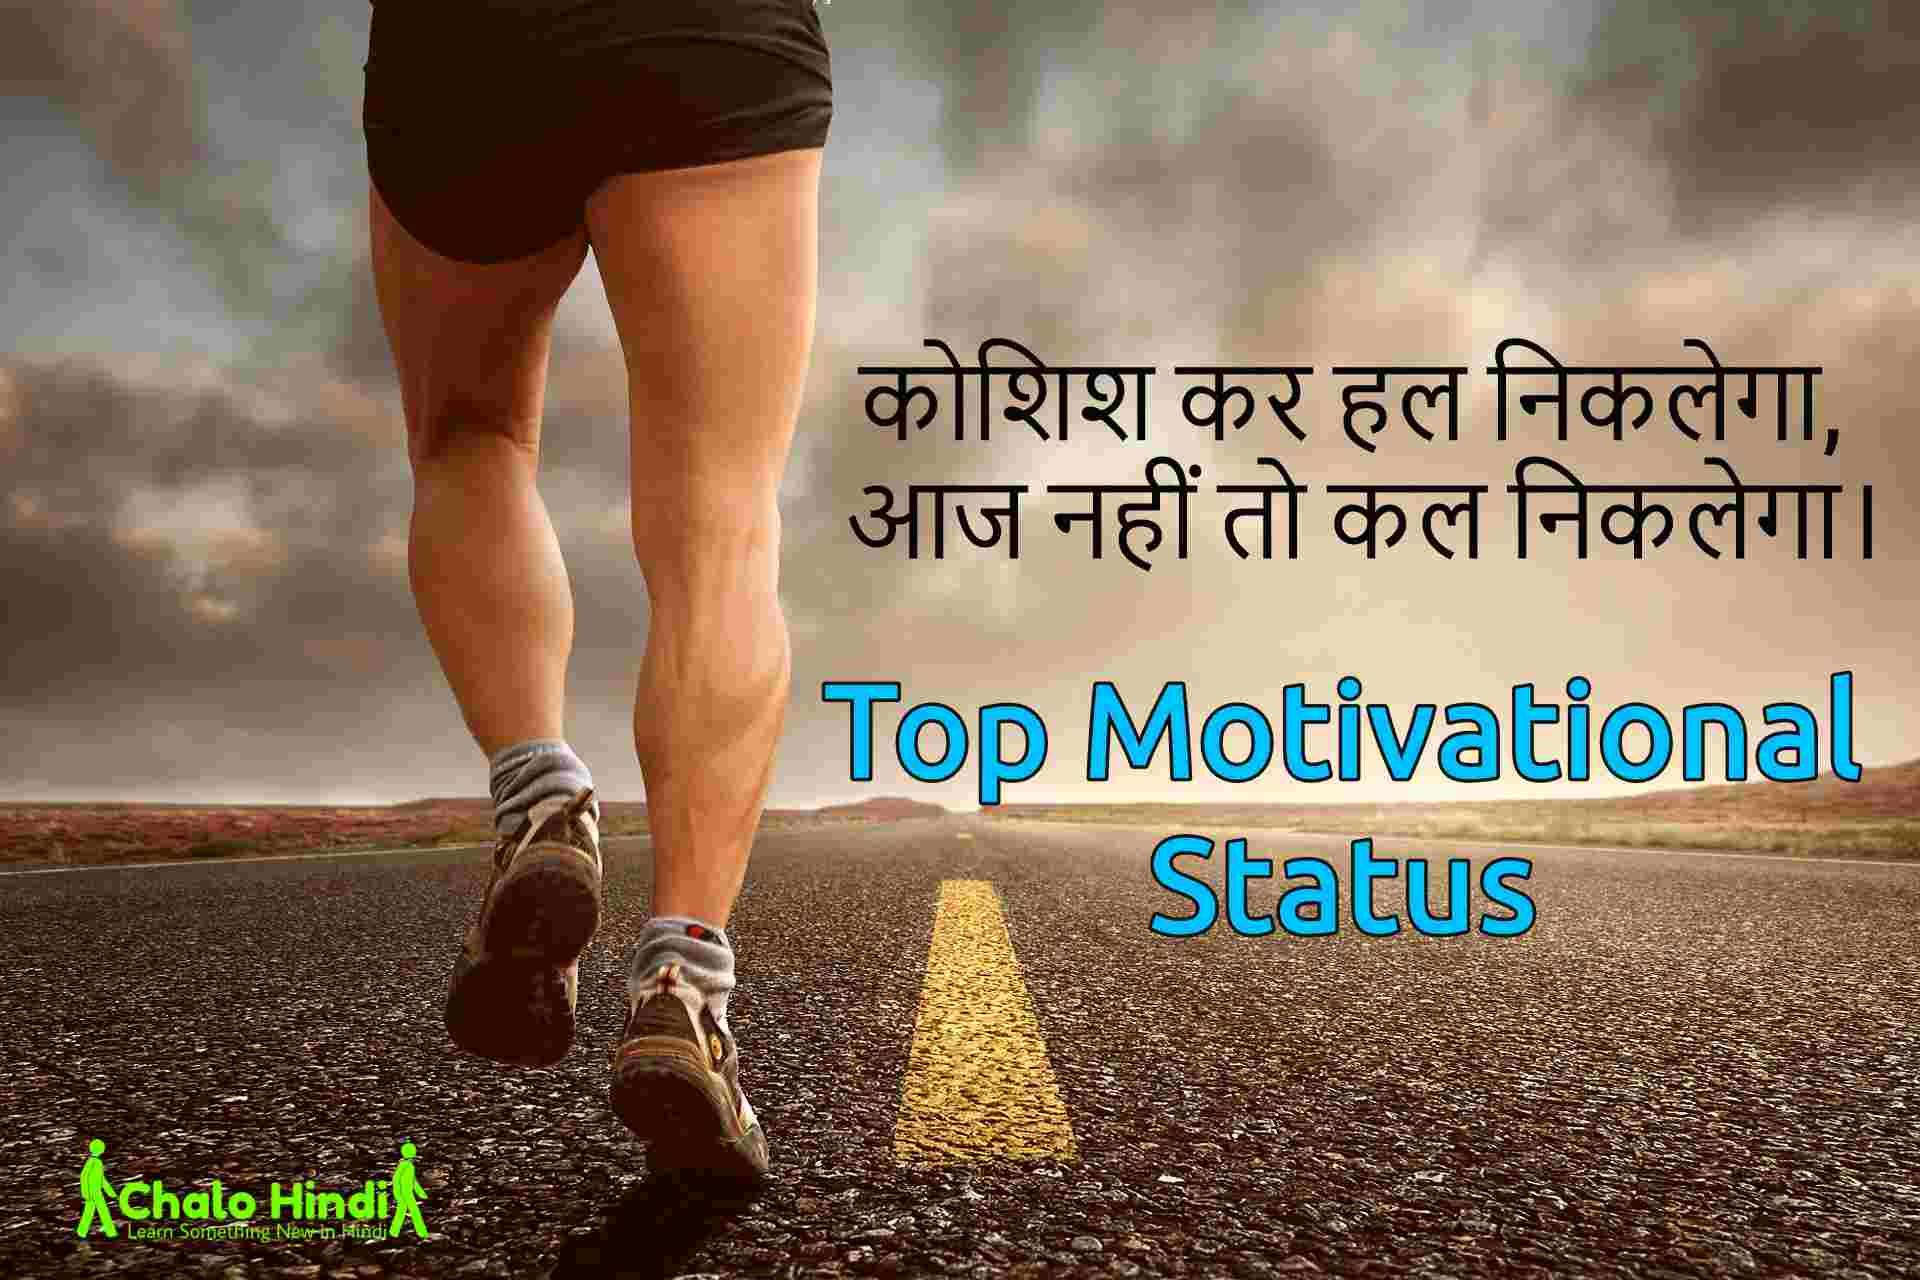 Beaches] Fb status in hindi 2019 motivational